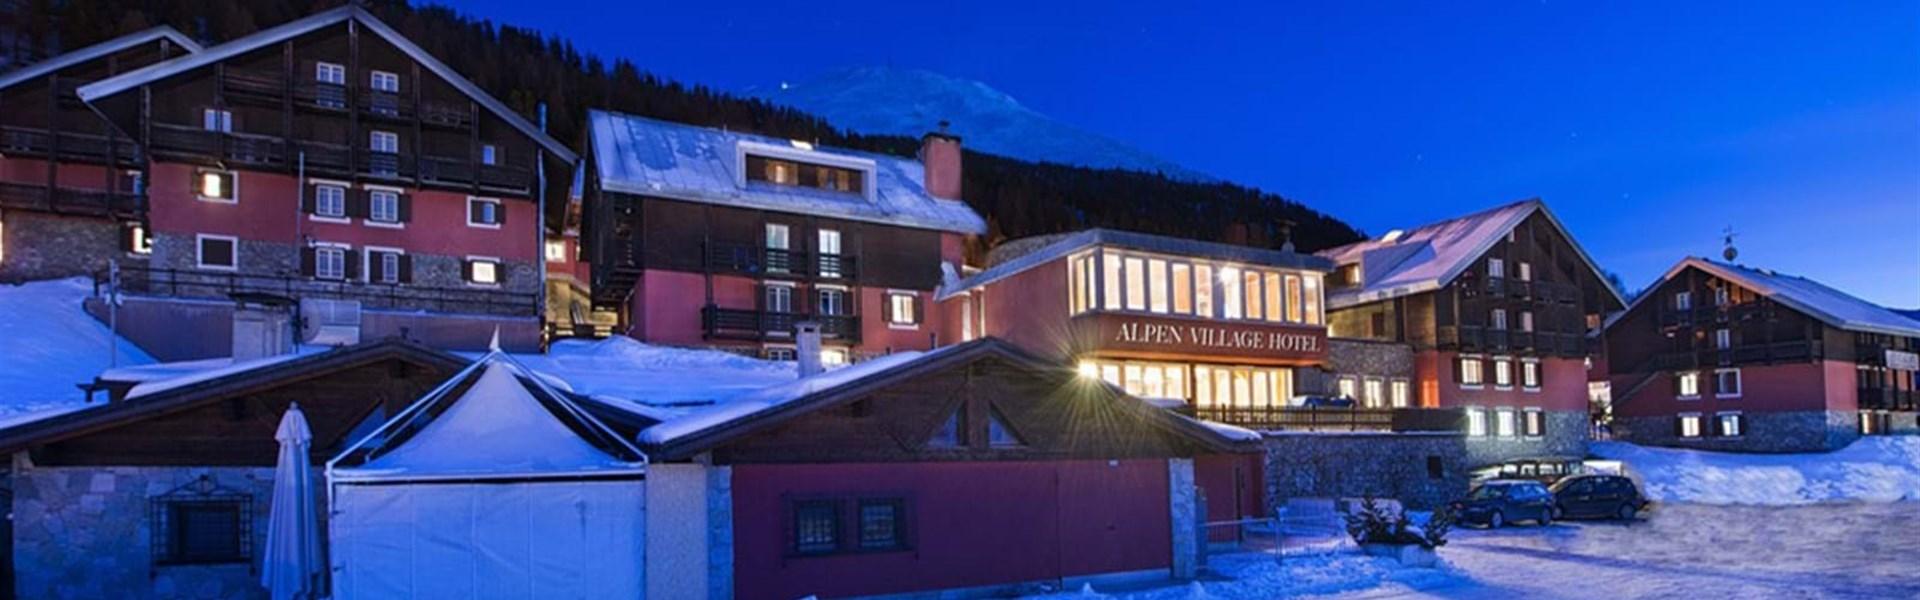 Marco Polo - Hotel Alpen VIllage -